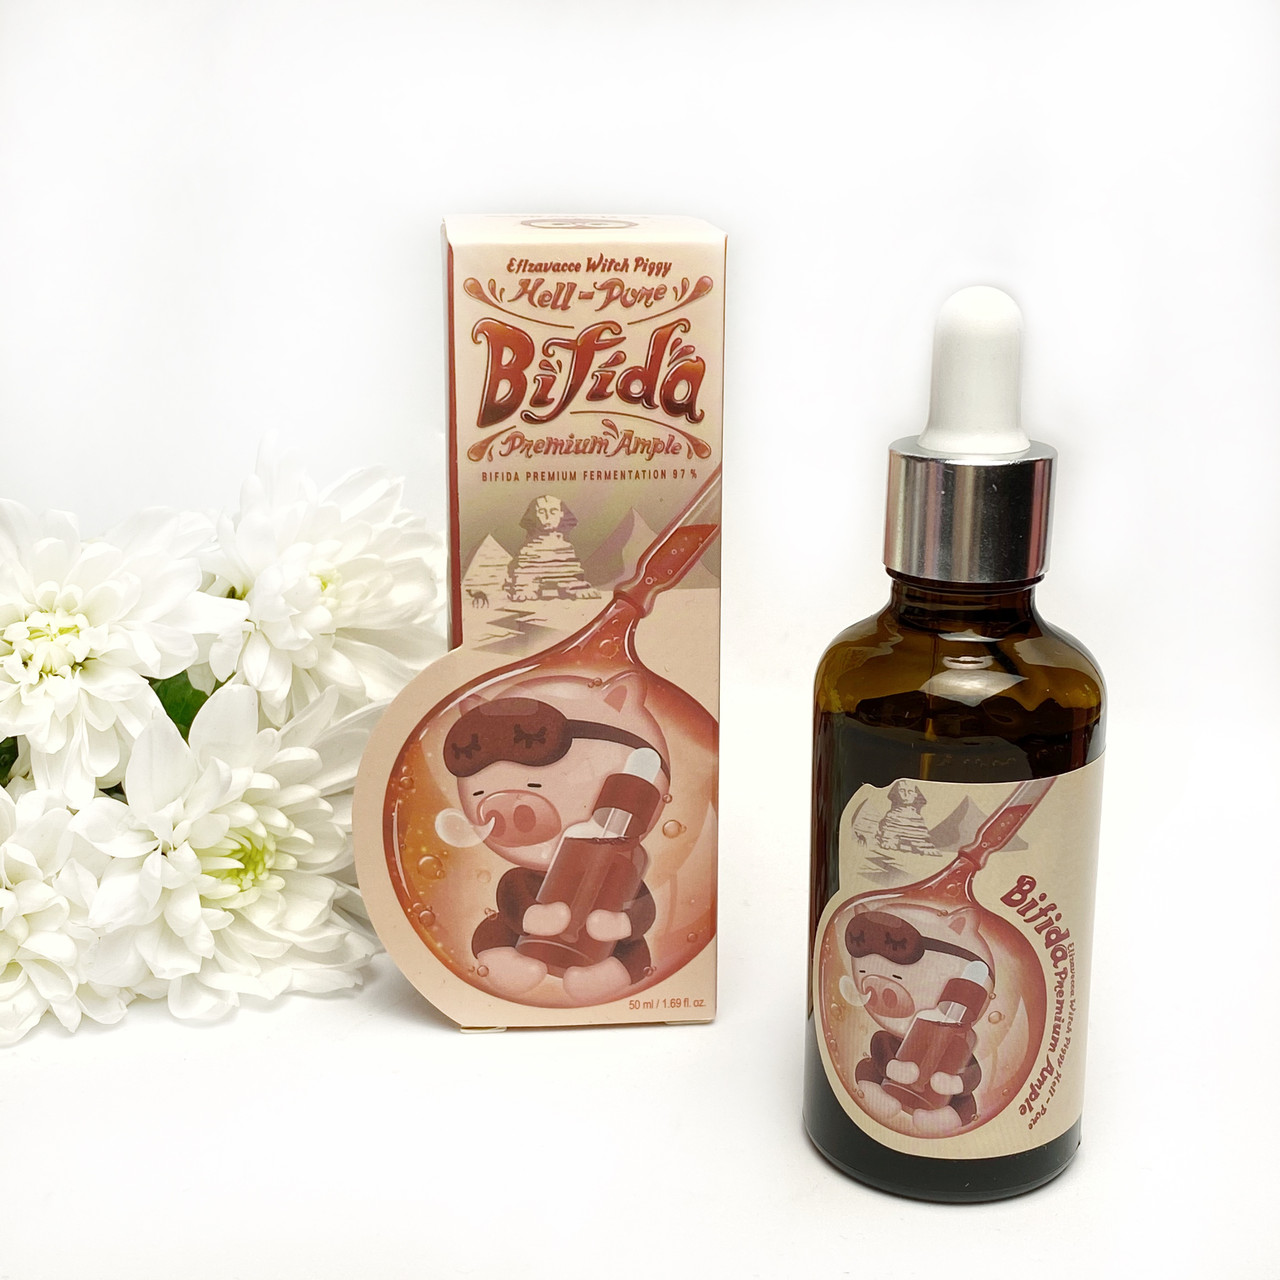 Сыворотка для лица с бифидобактериями Elizavecca Witch Piggy Hell-Pore